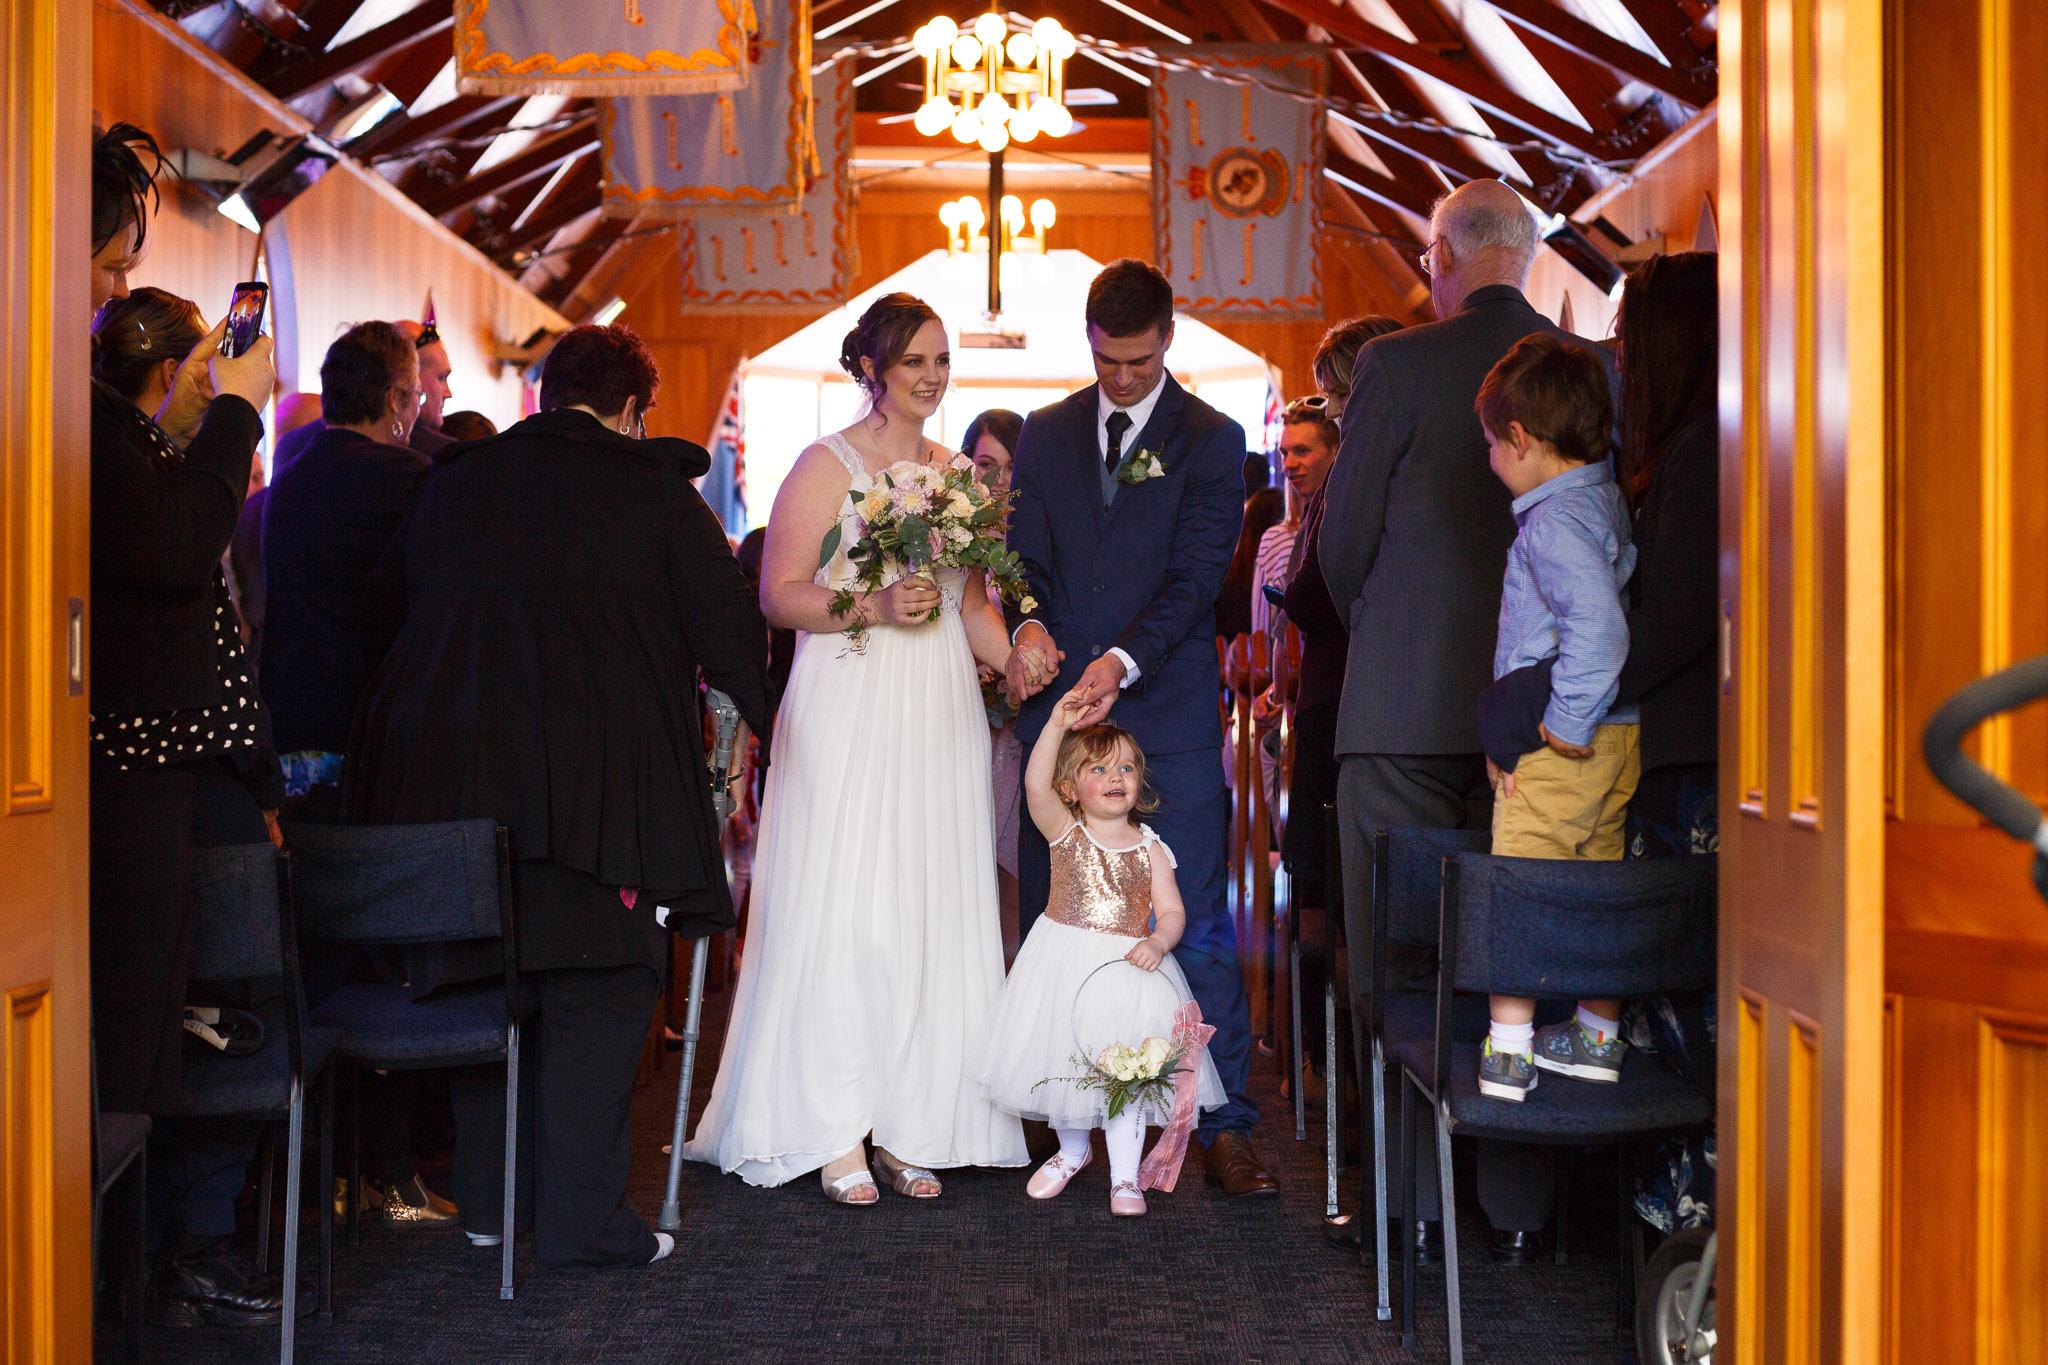 highlight_wedding_photography_manawatu_palmerston_north_new_zealand_rangitikei_golf_ohakea-26.jpg